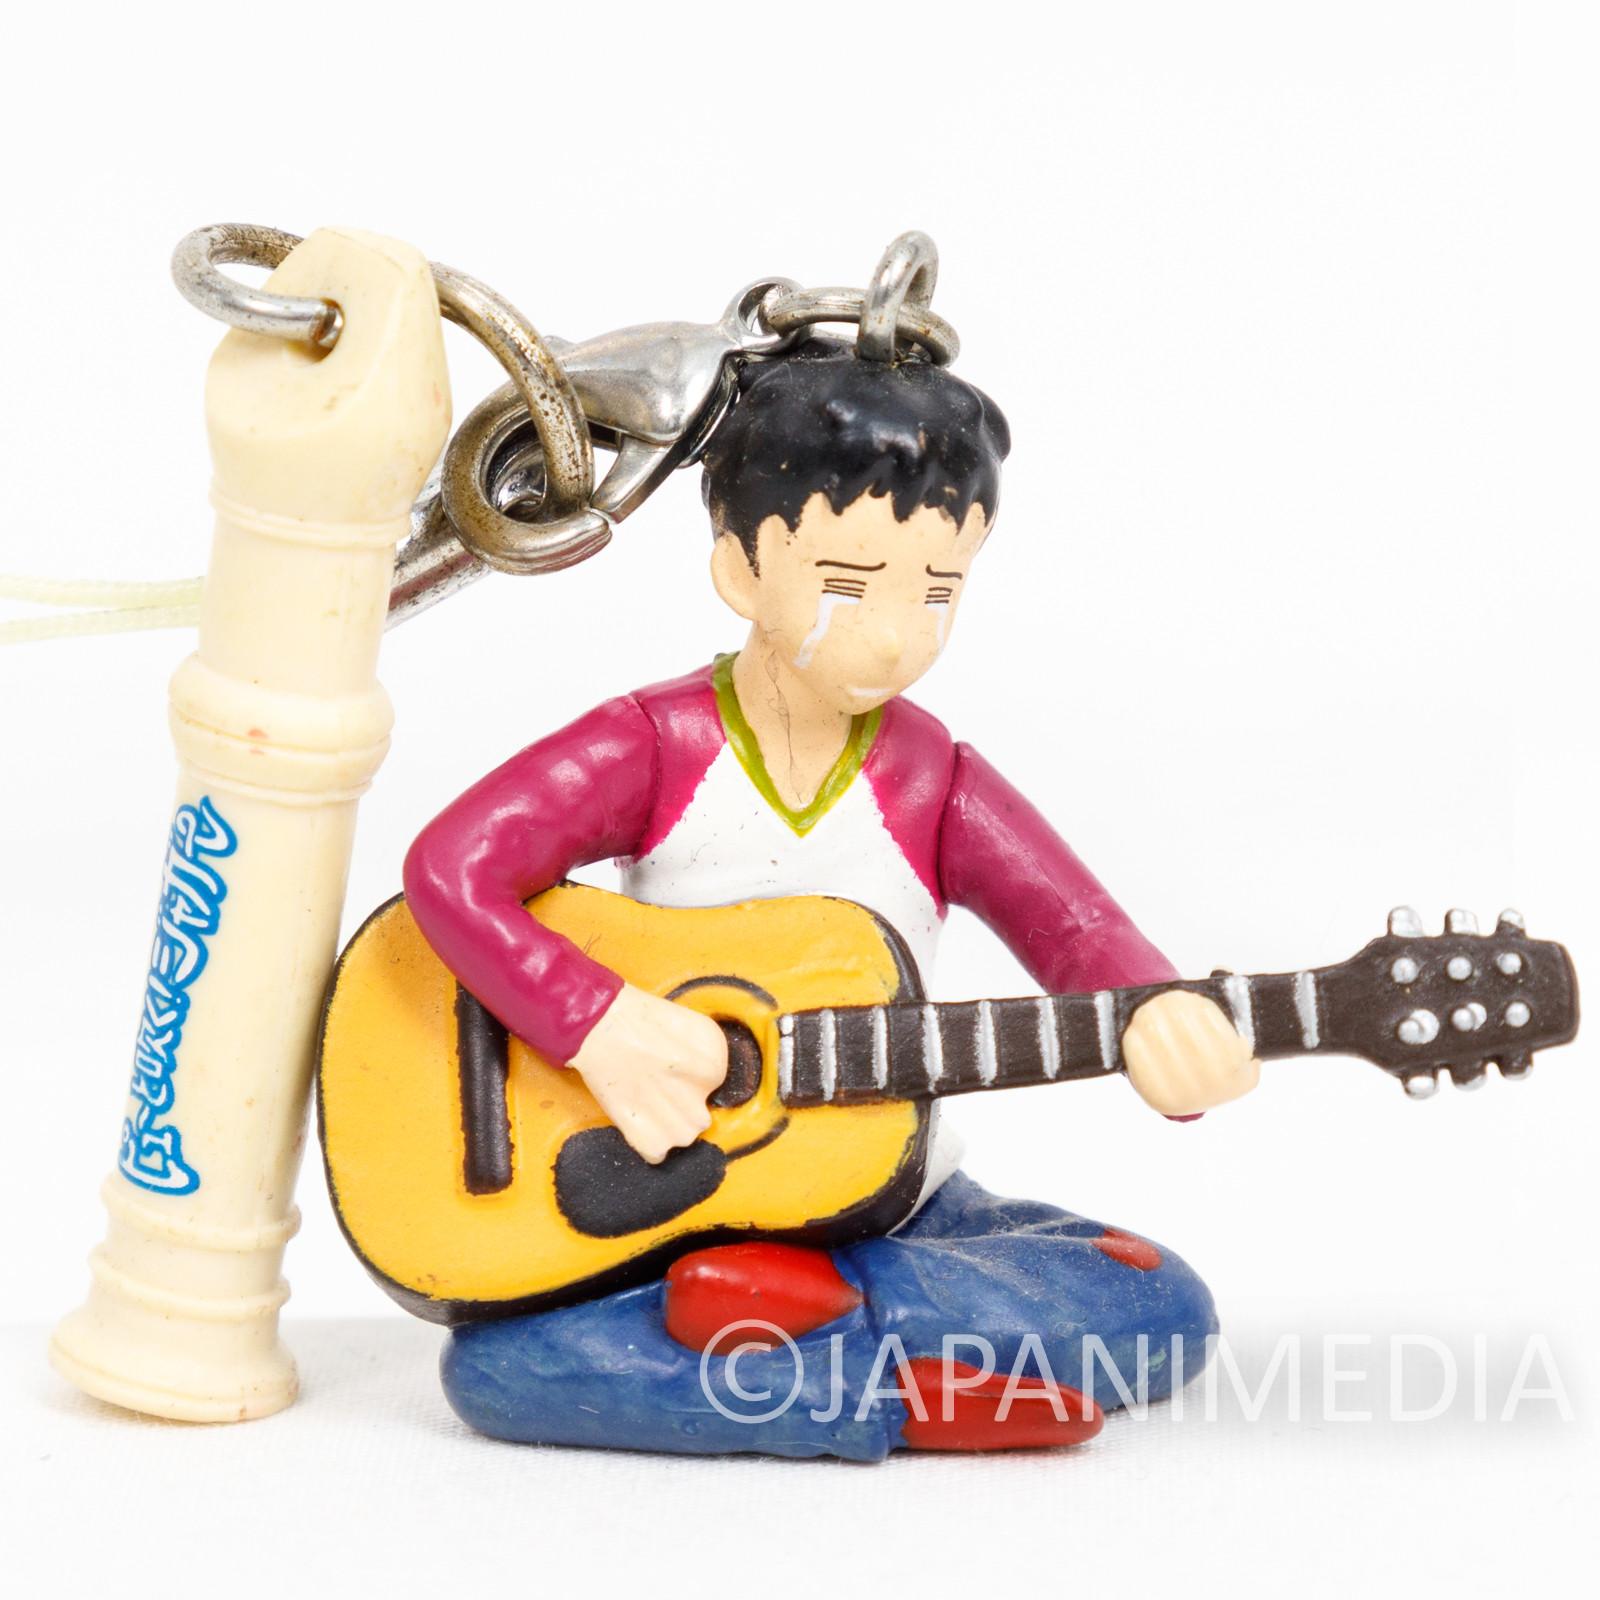 Pyu to Fuku! Jaguar Piyohiko with Guitar Figure Strap JAPAN ANIME